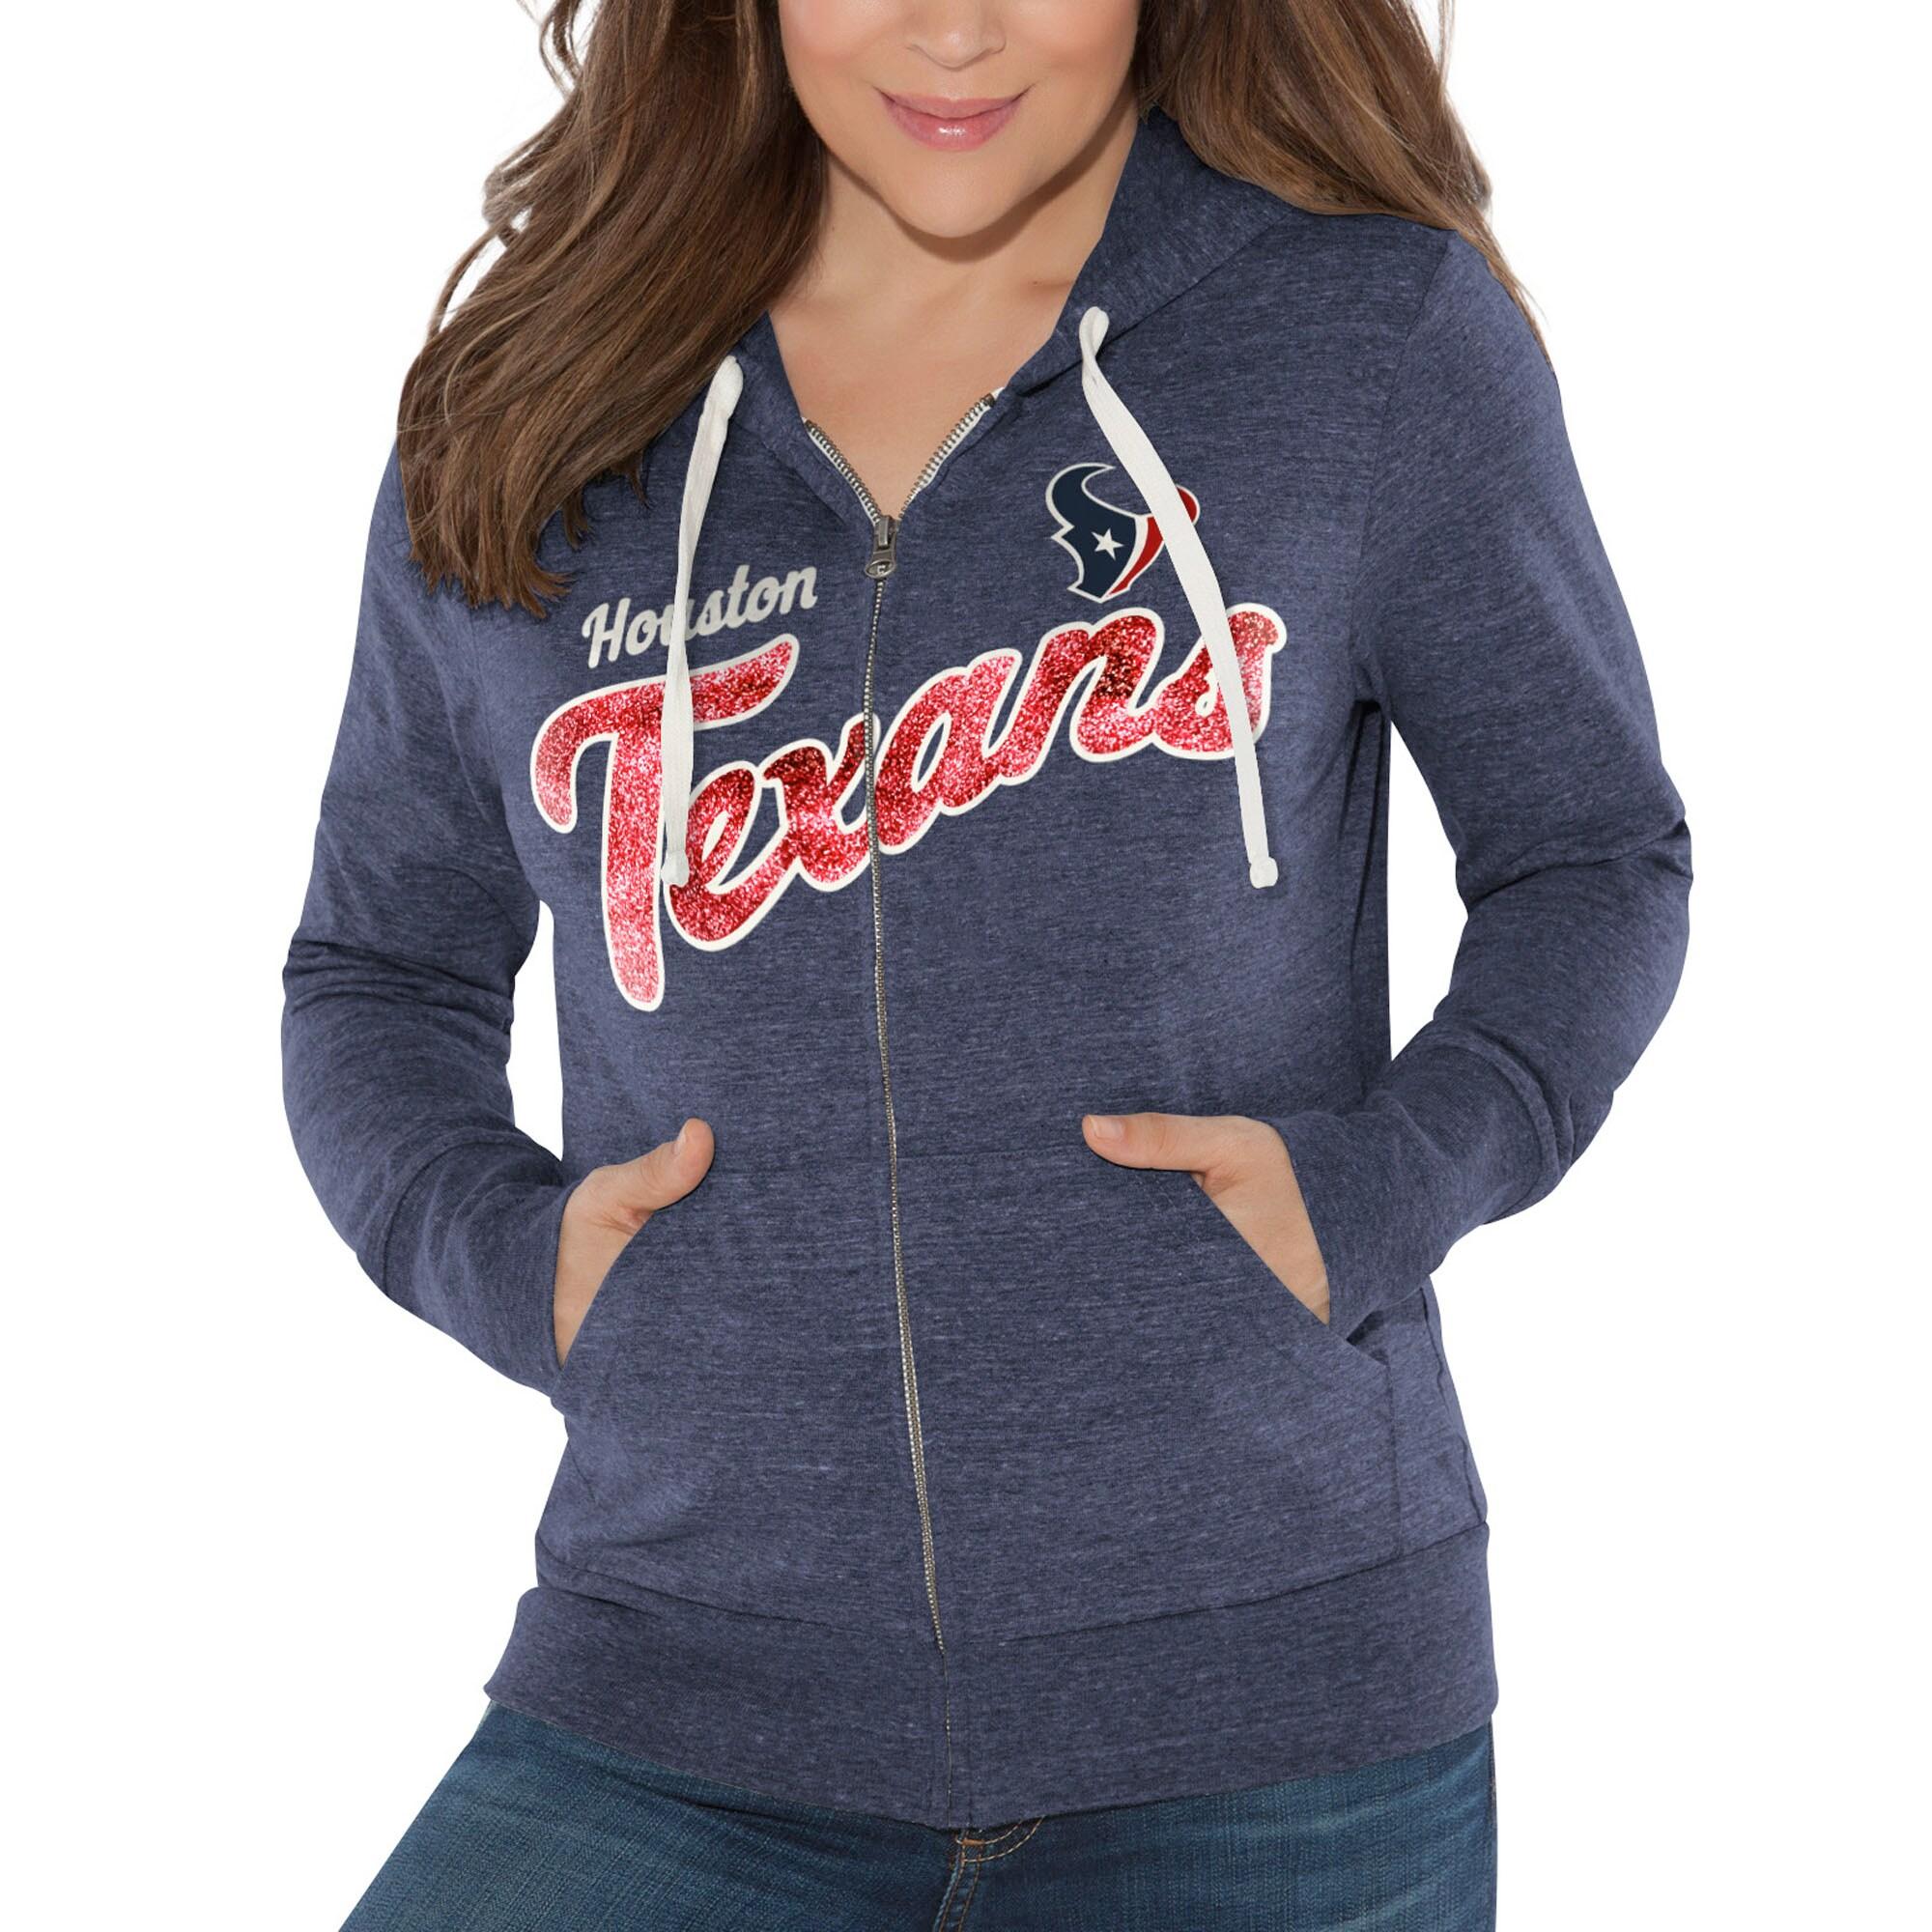 Houston Texans Touch by Alyssa Milano Women's All American Full-Zip Hoodie - Navy